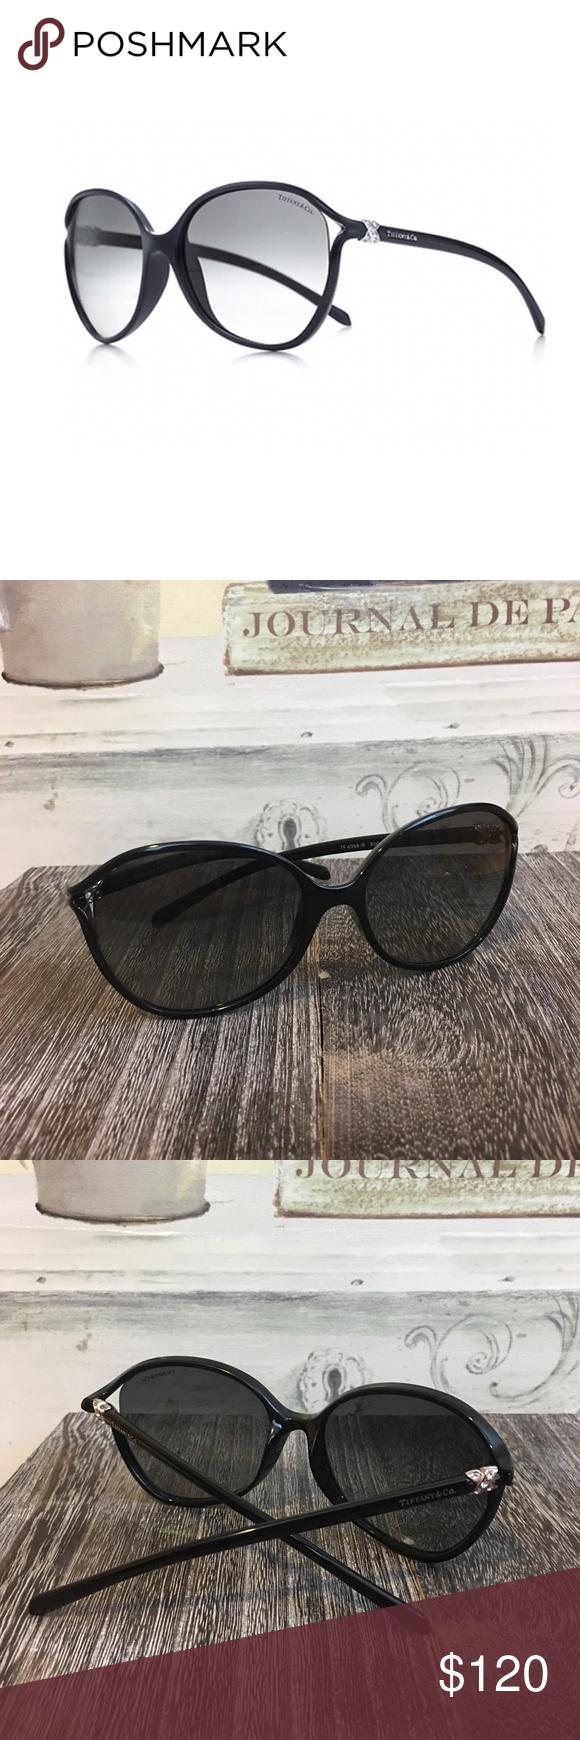 ad283583212d Accessories Sunglasses. Tiffany   Co. Sunglasses Tiffany   Co. sunglasses  with Swarovski crystals accents in the